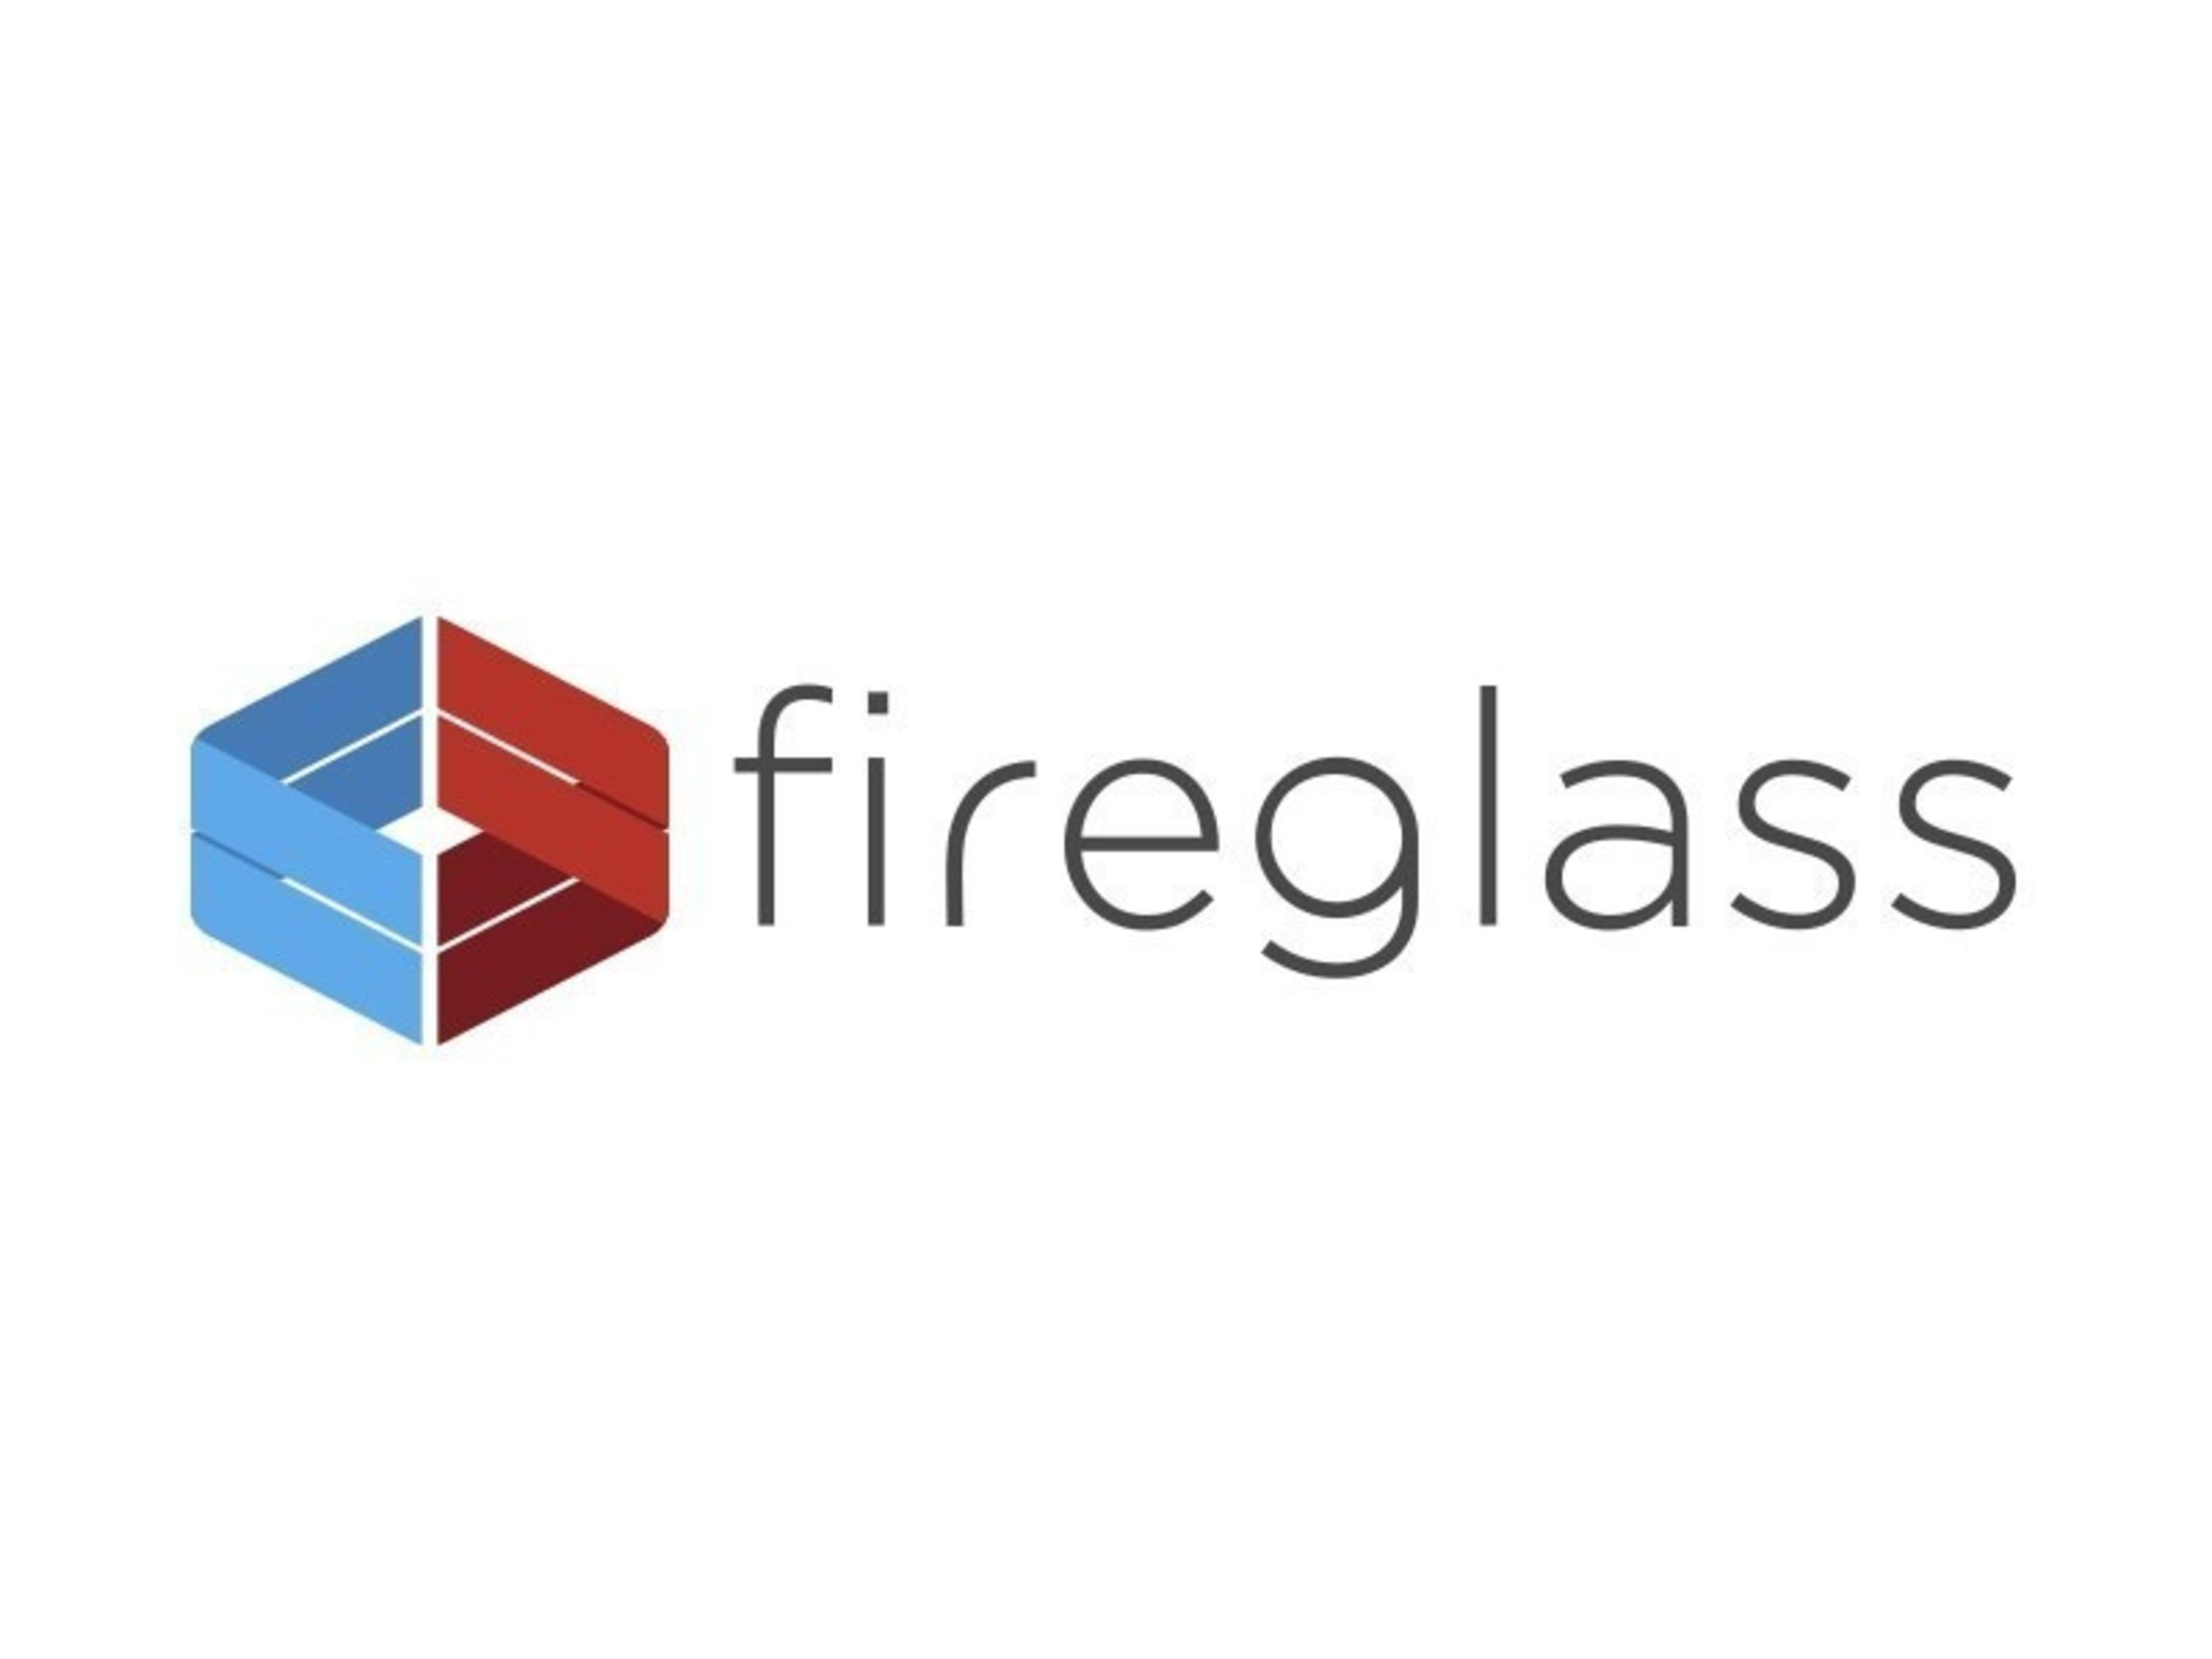 Fireglass logo. (PRNewsFoto/Fireglass)